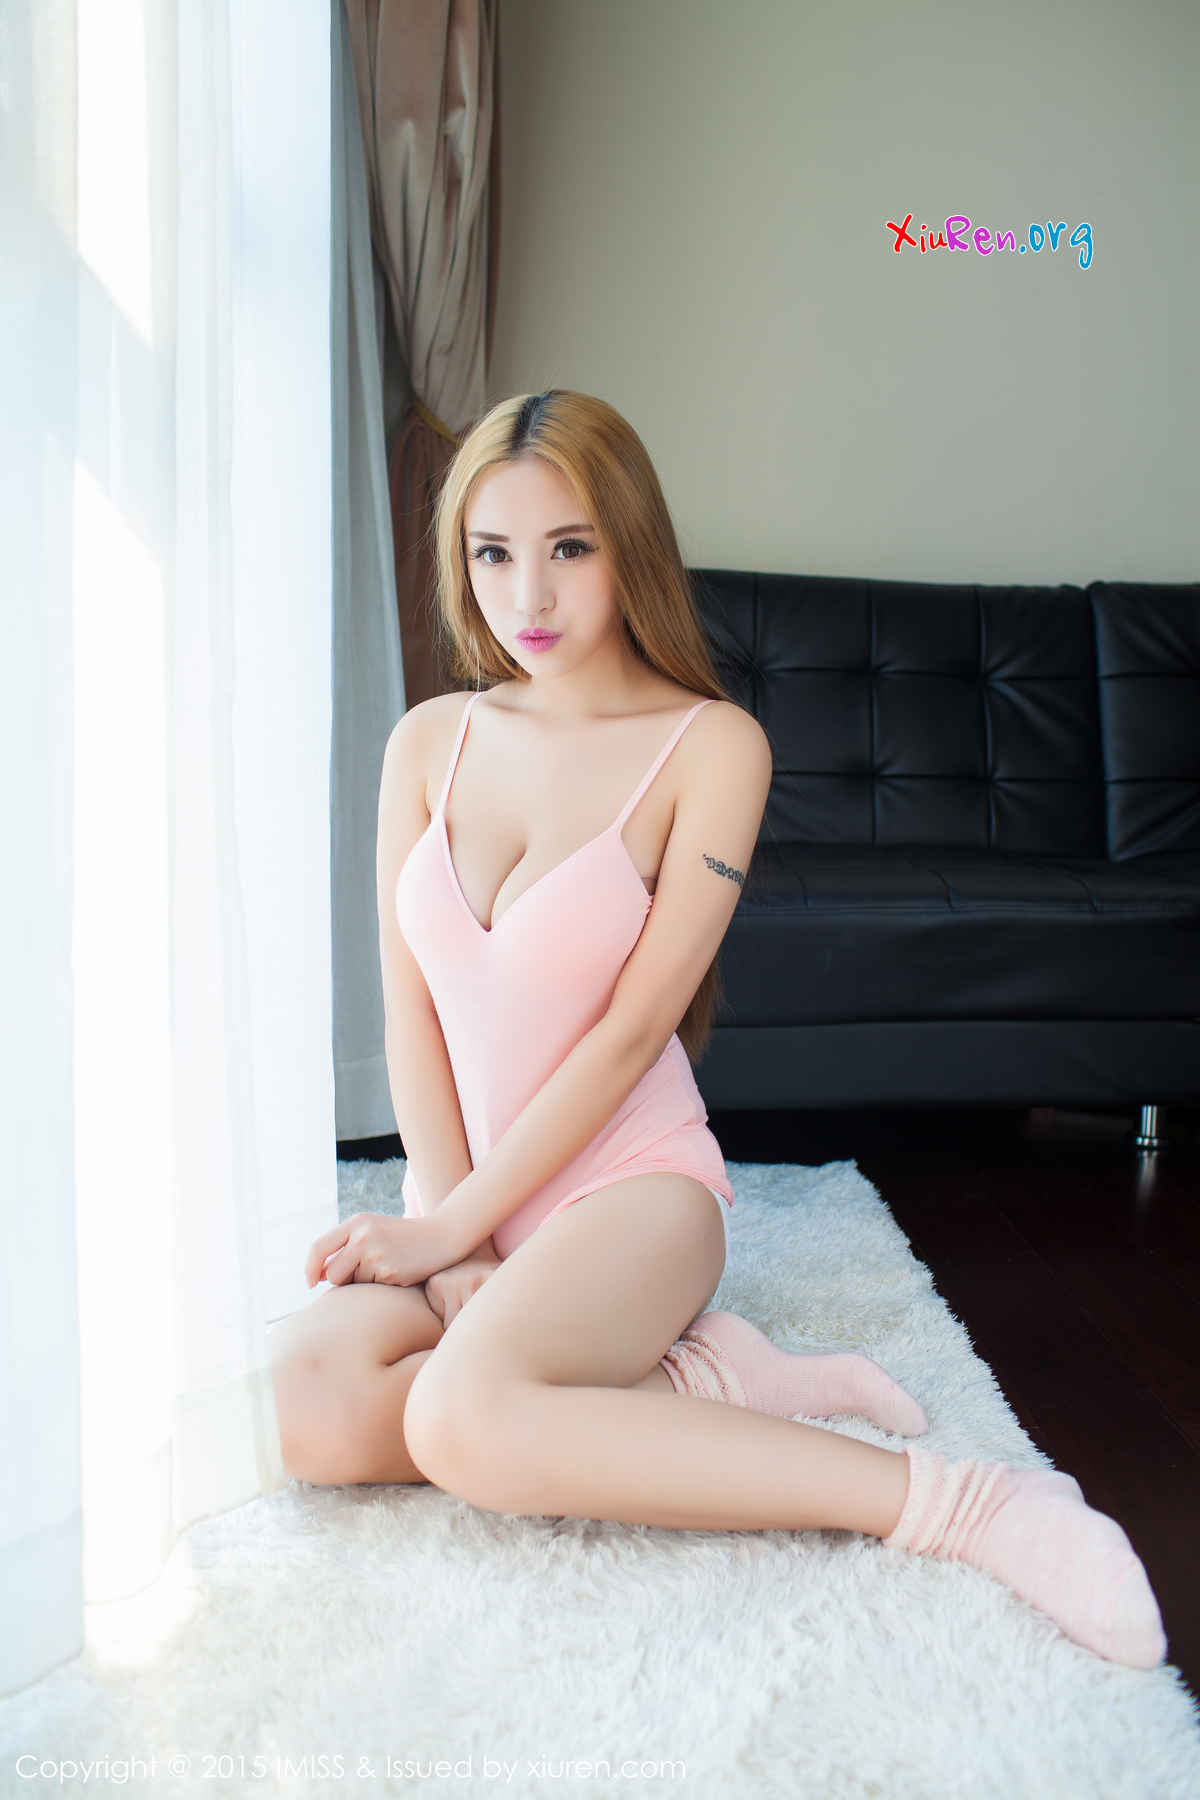 http://www.xiuren.org/imiss/042/0043.jpg